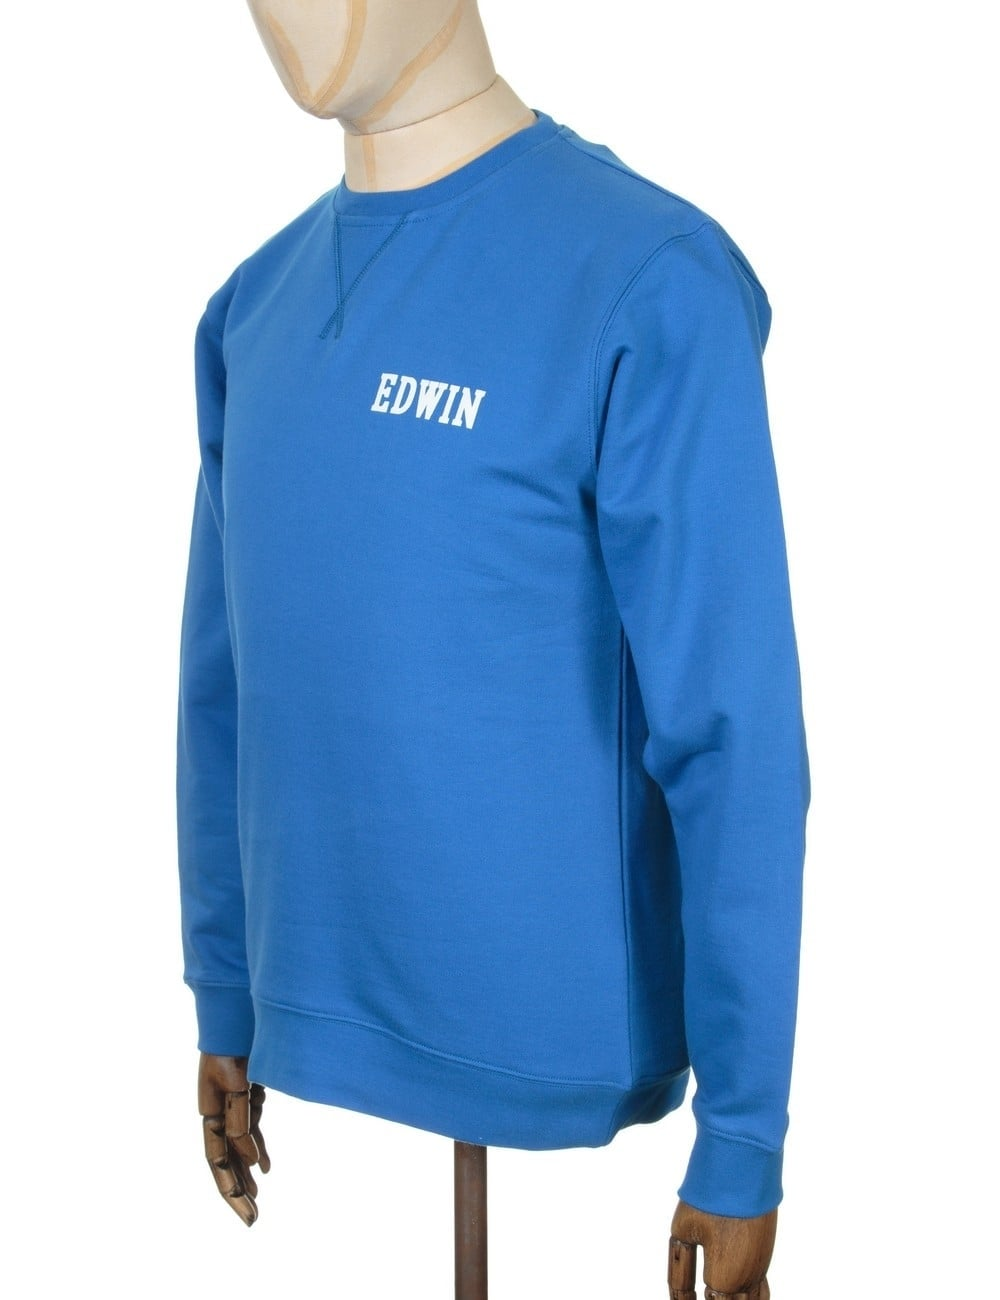 eb190b65c43 Edwin Jeans Classic Logo Sweatshirt - Royal Blue - Clothing from Fat ...